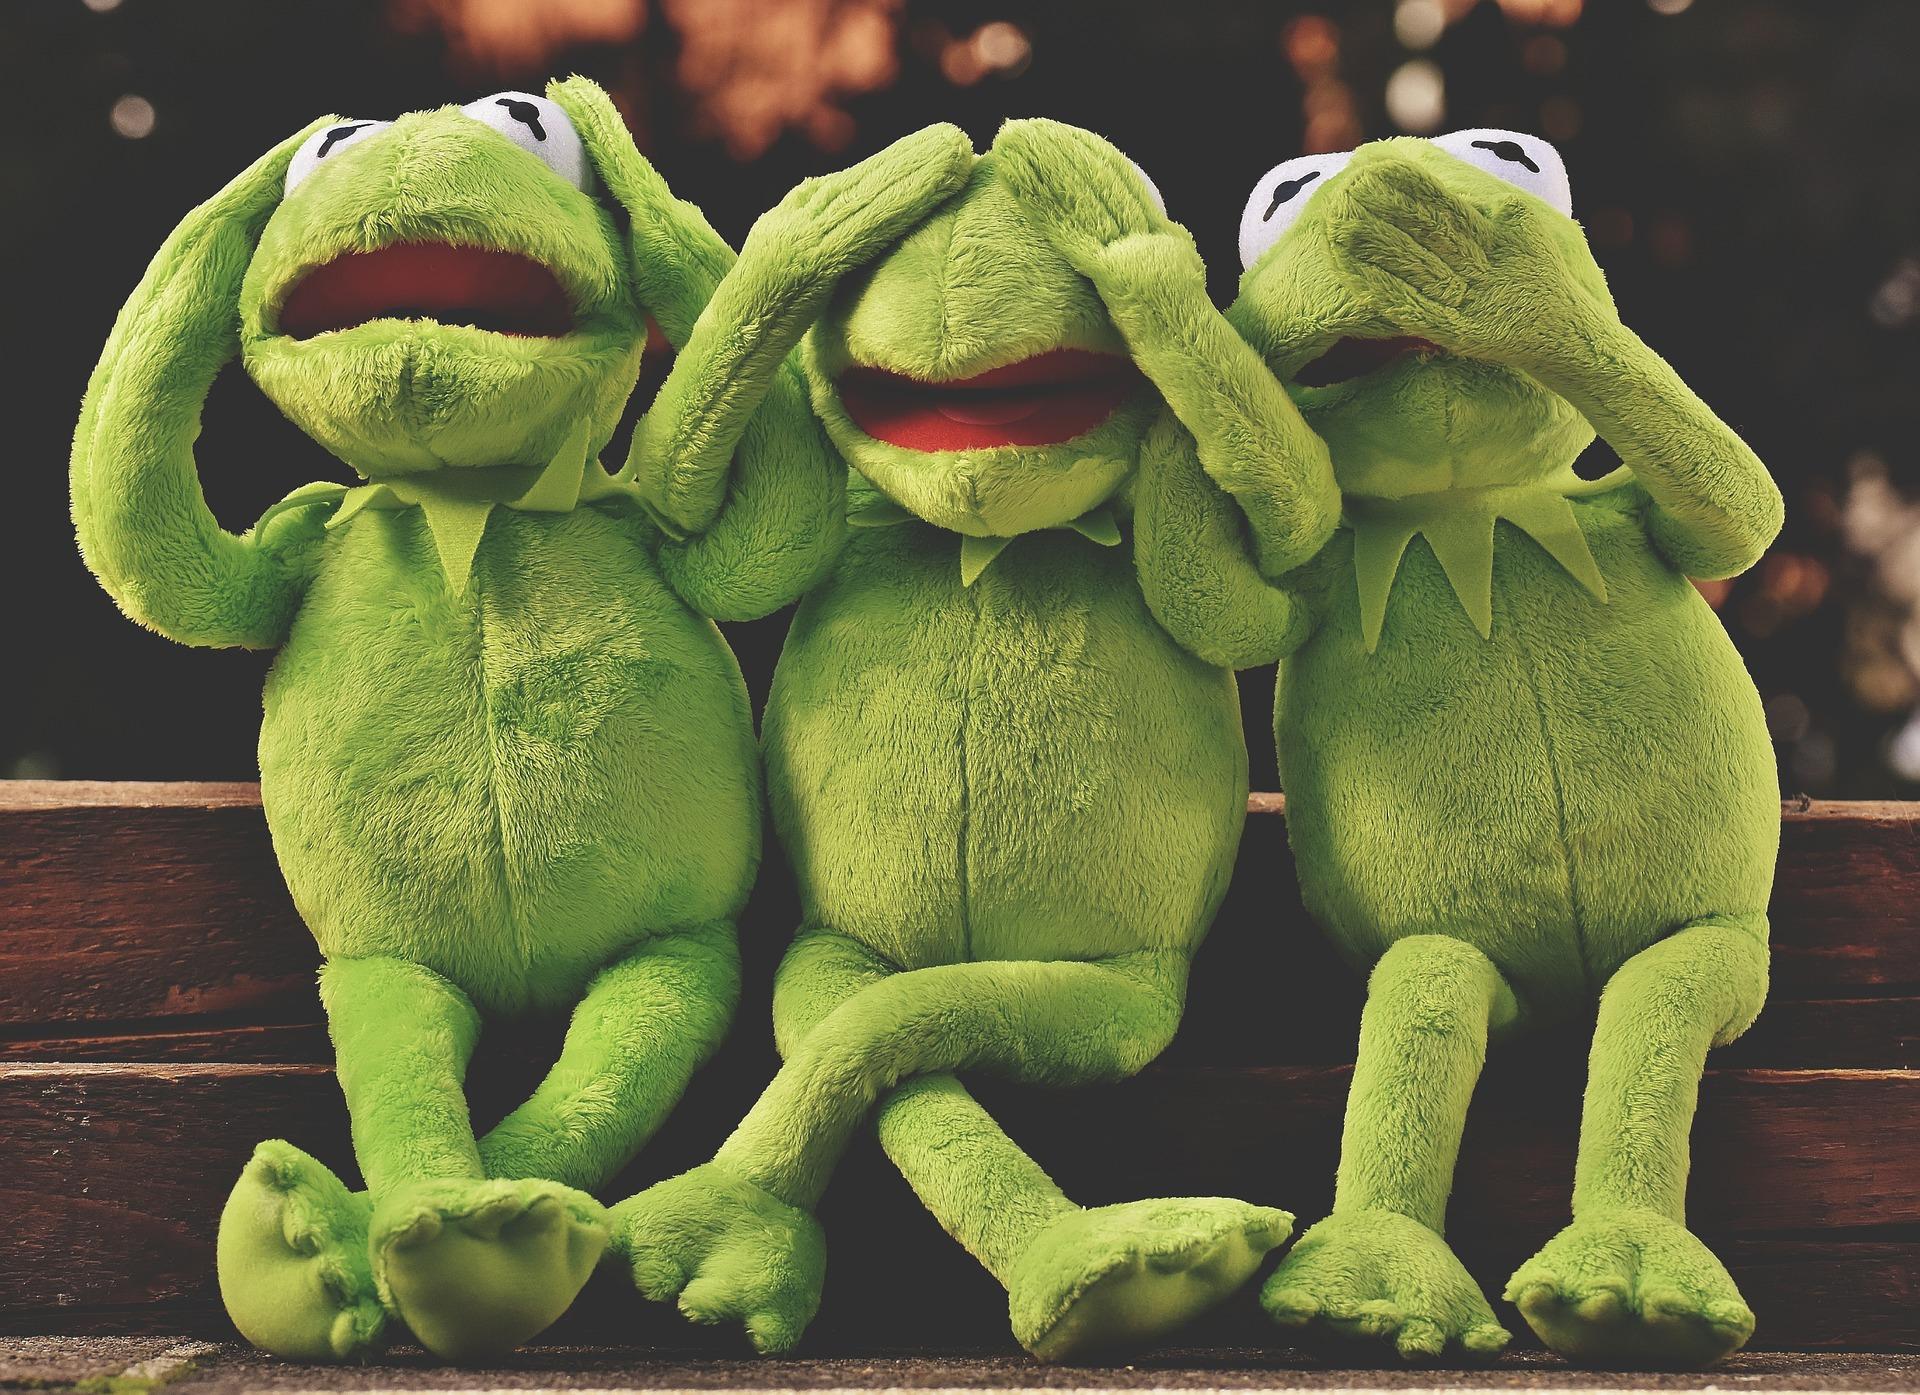 Frogs - see no evil, speak no evil, hear no evil